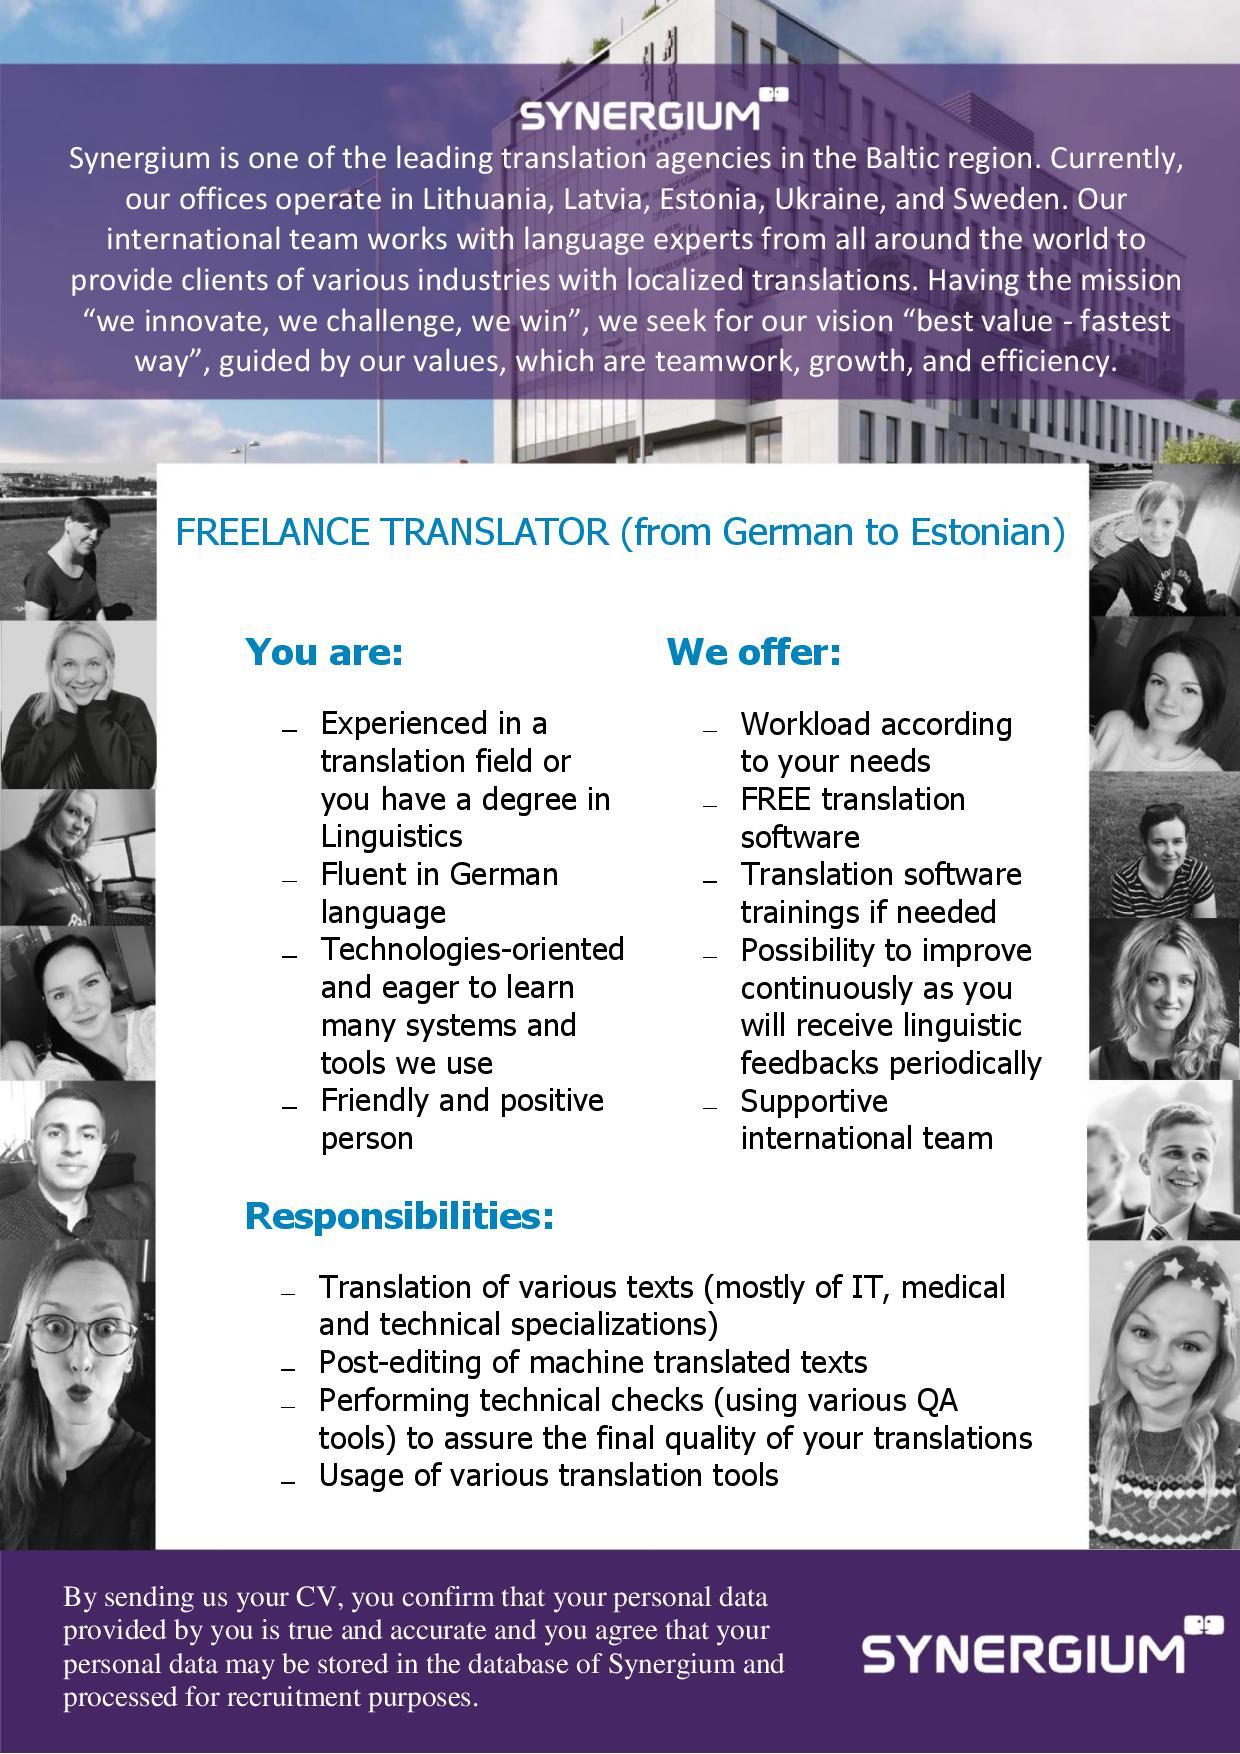 freelance translator from german to estonian job advertisement synergium